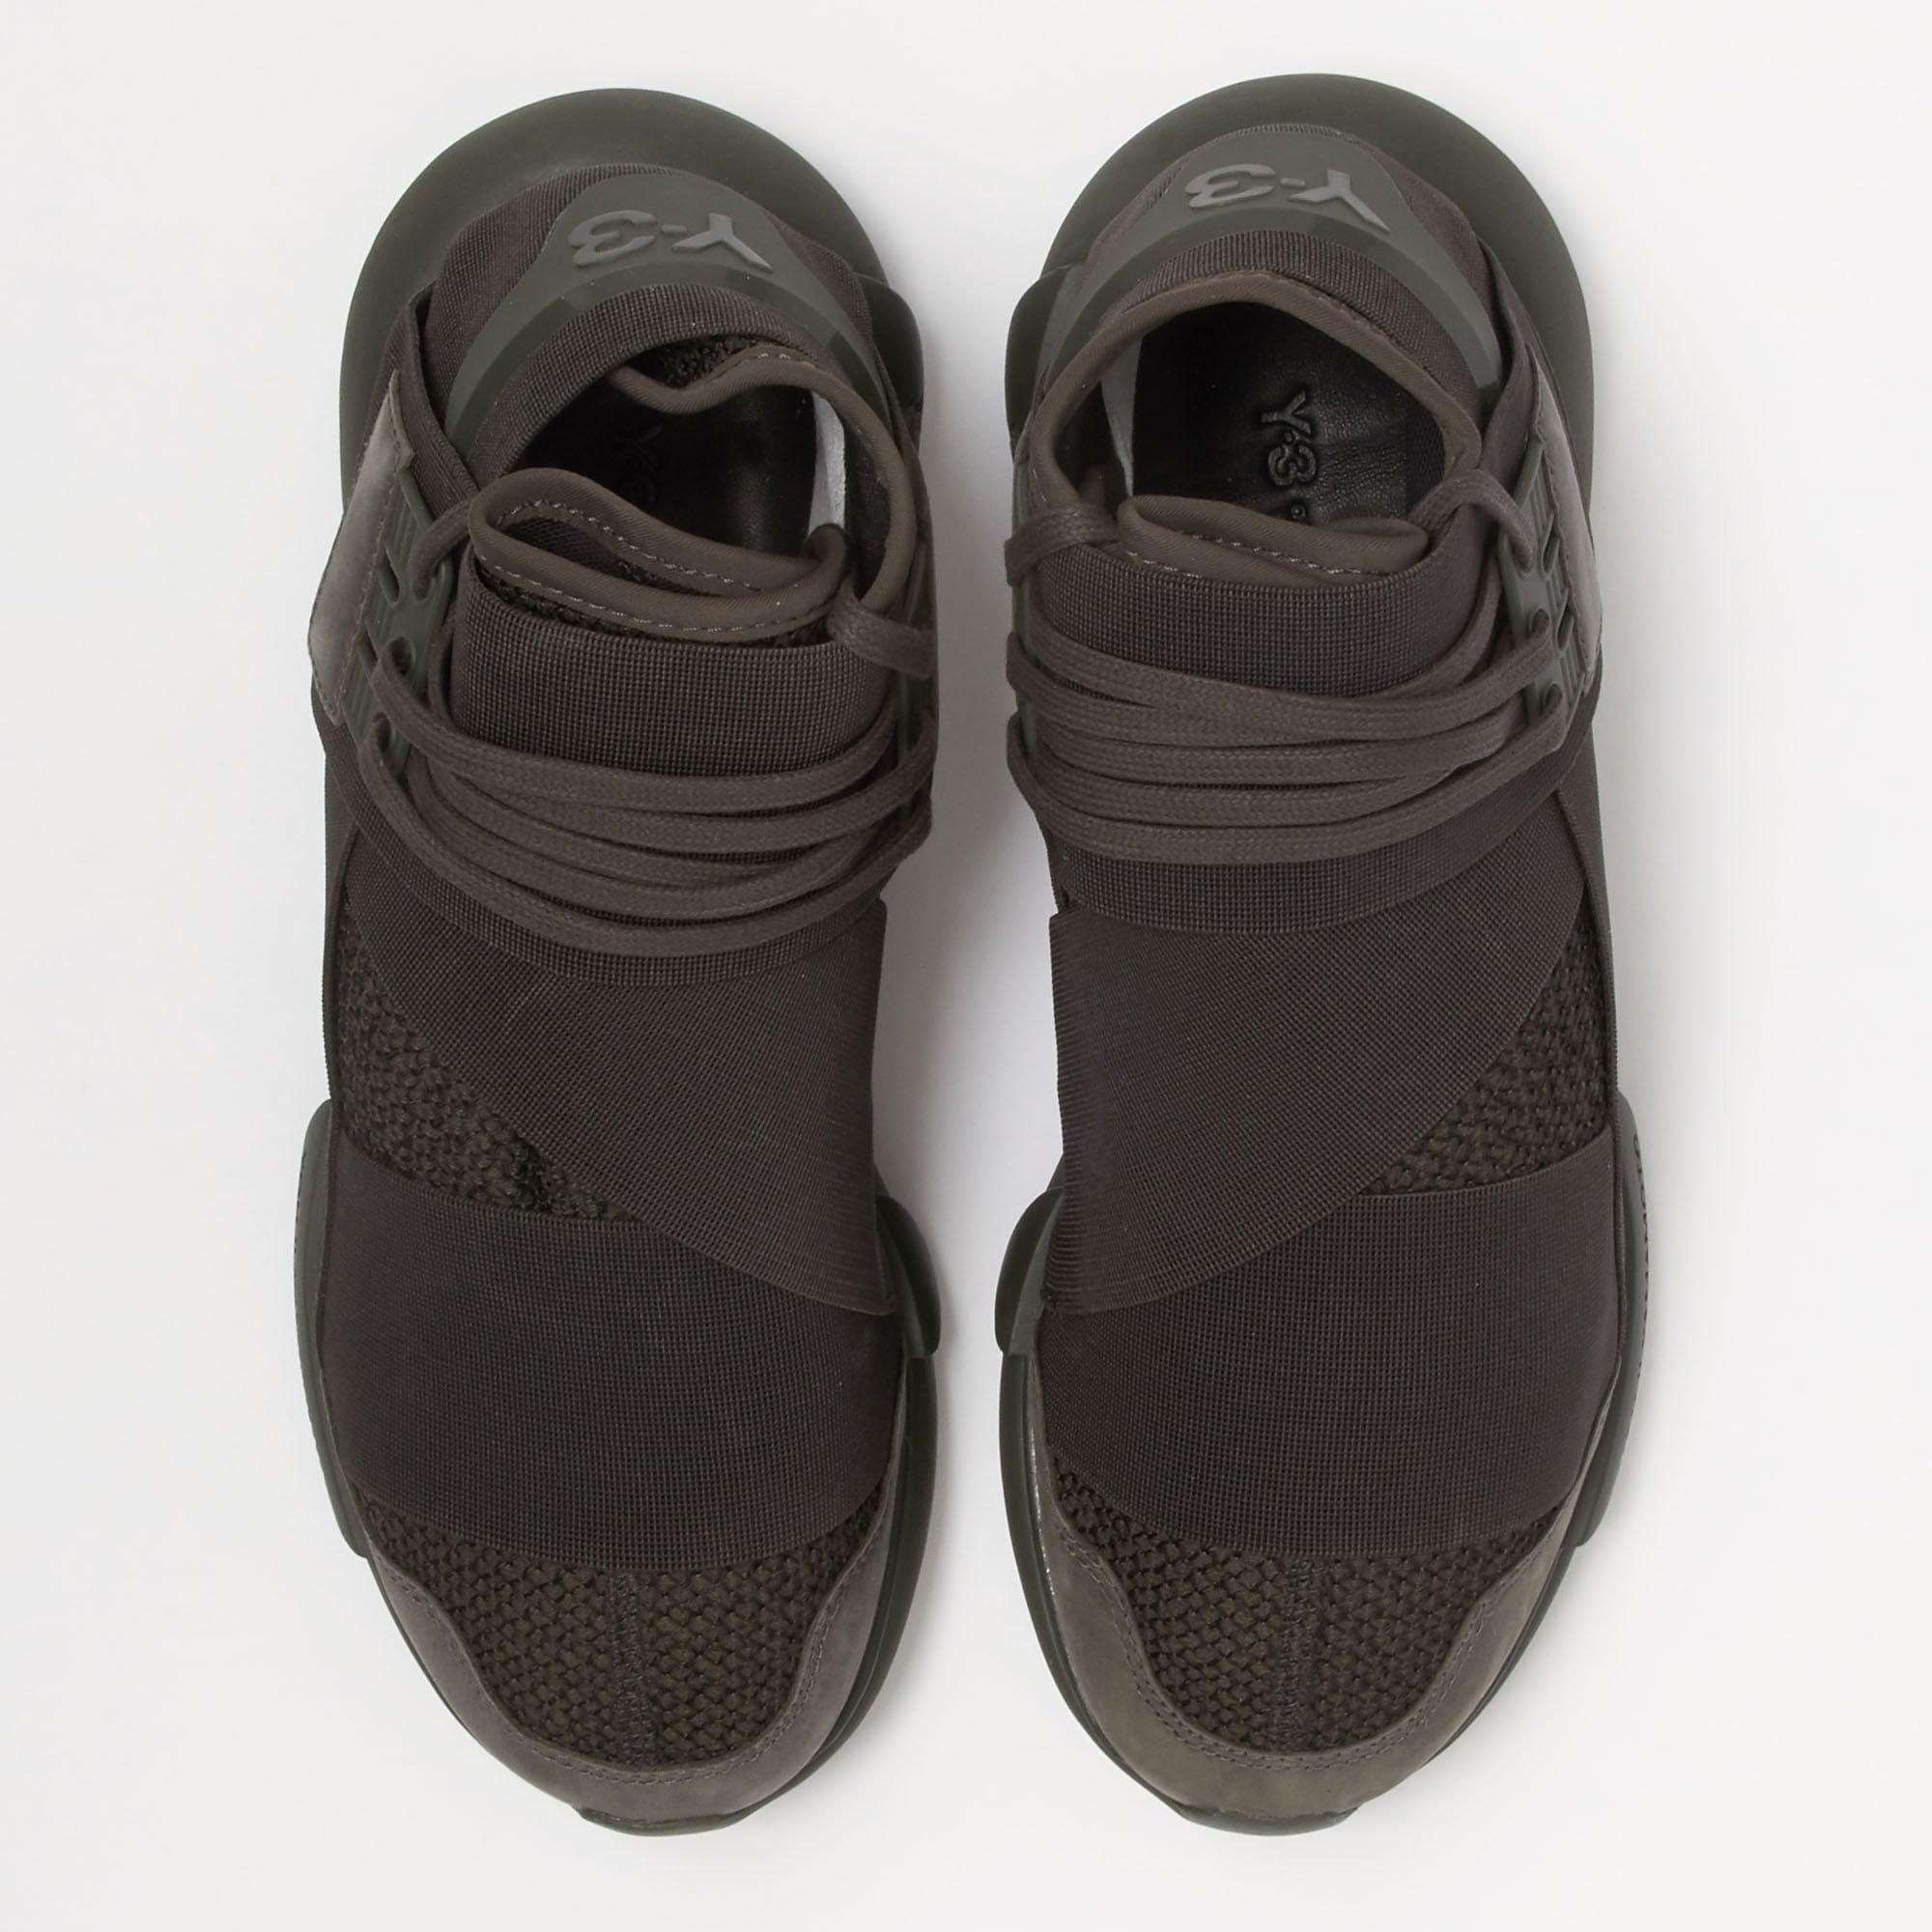 c75ba0ec07017 Adidas Y-3 Qasa High (Black Olive) Sneakers